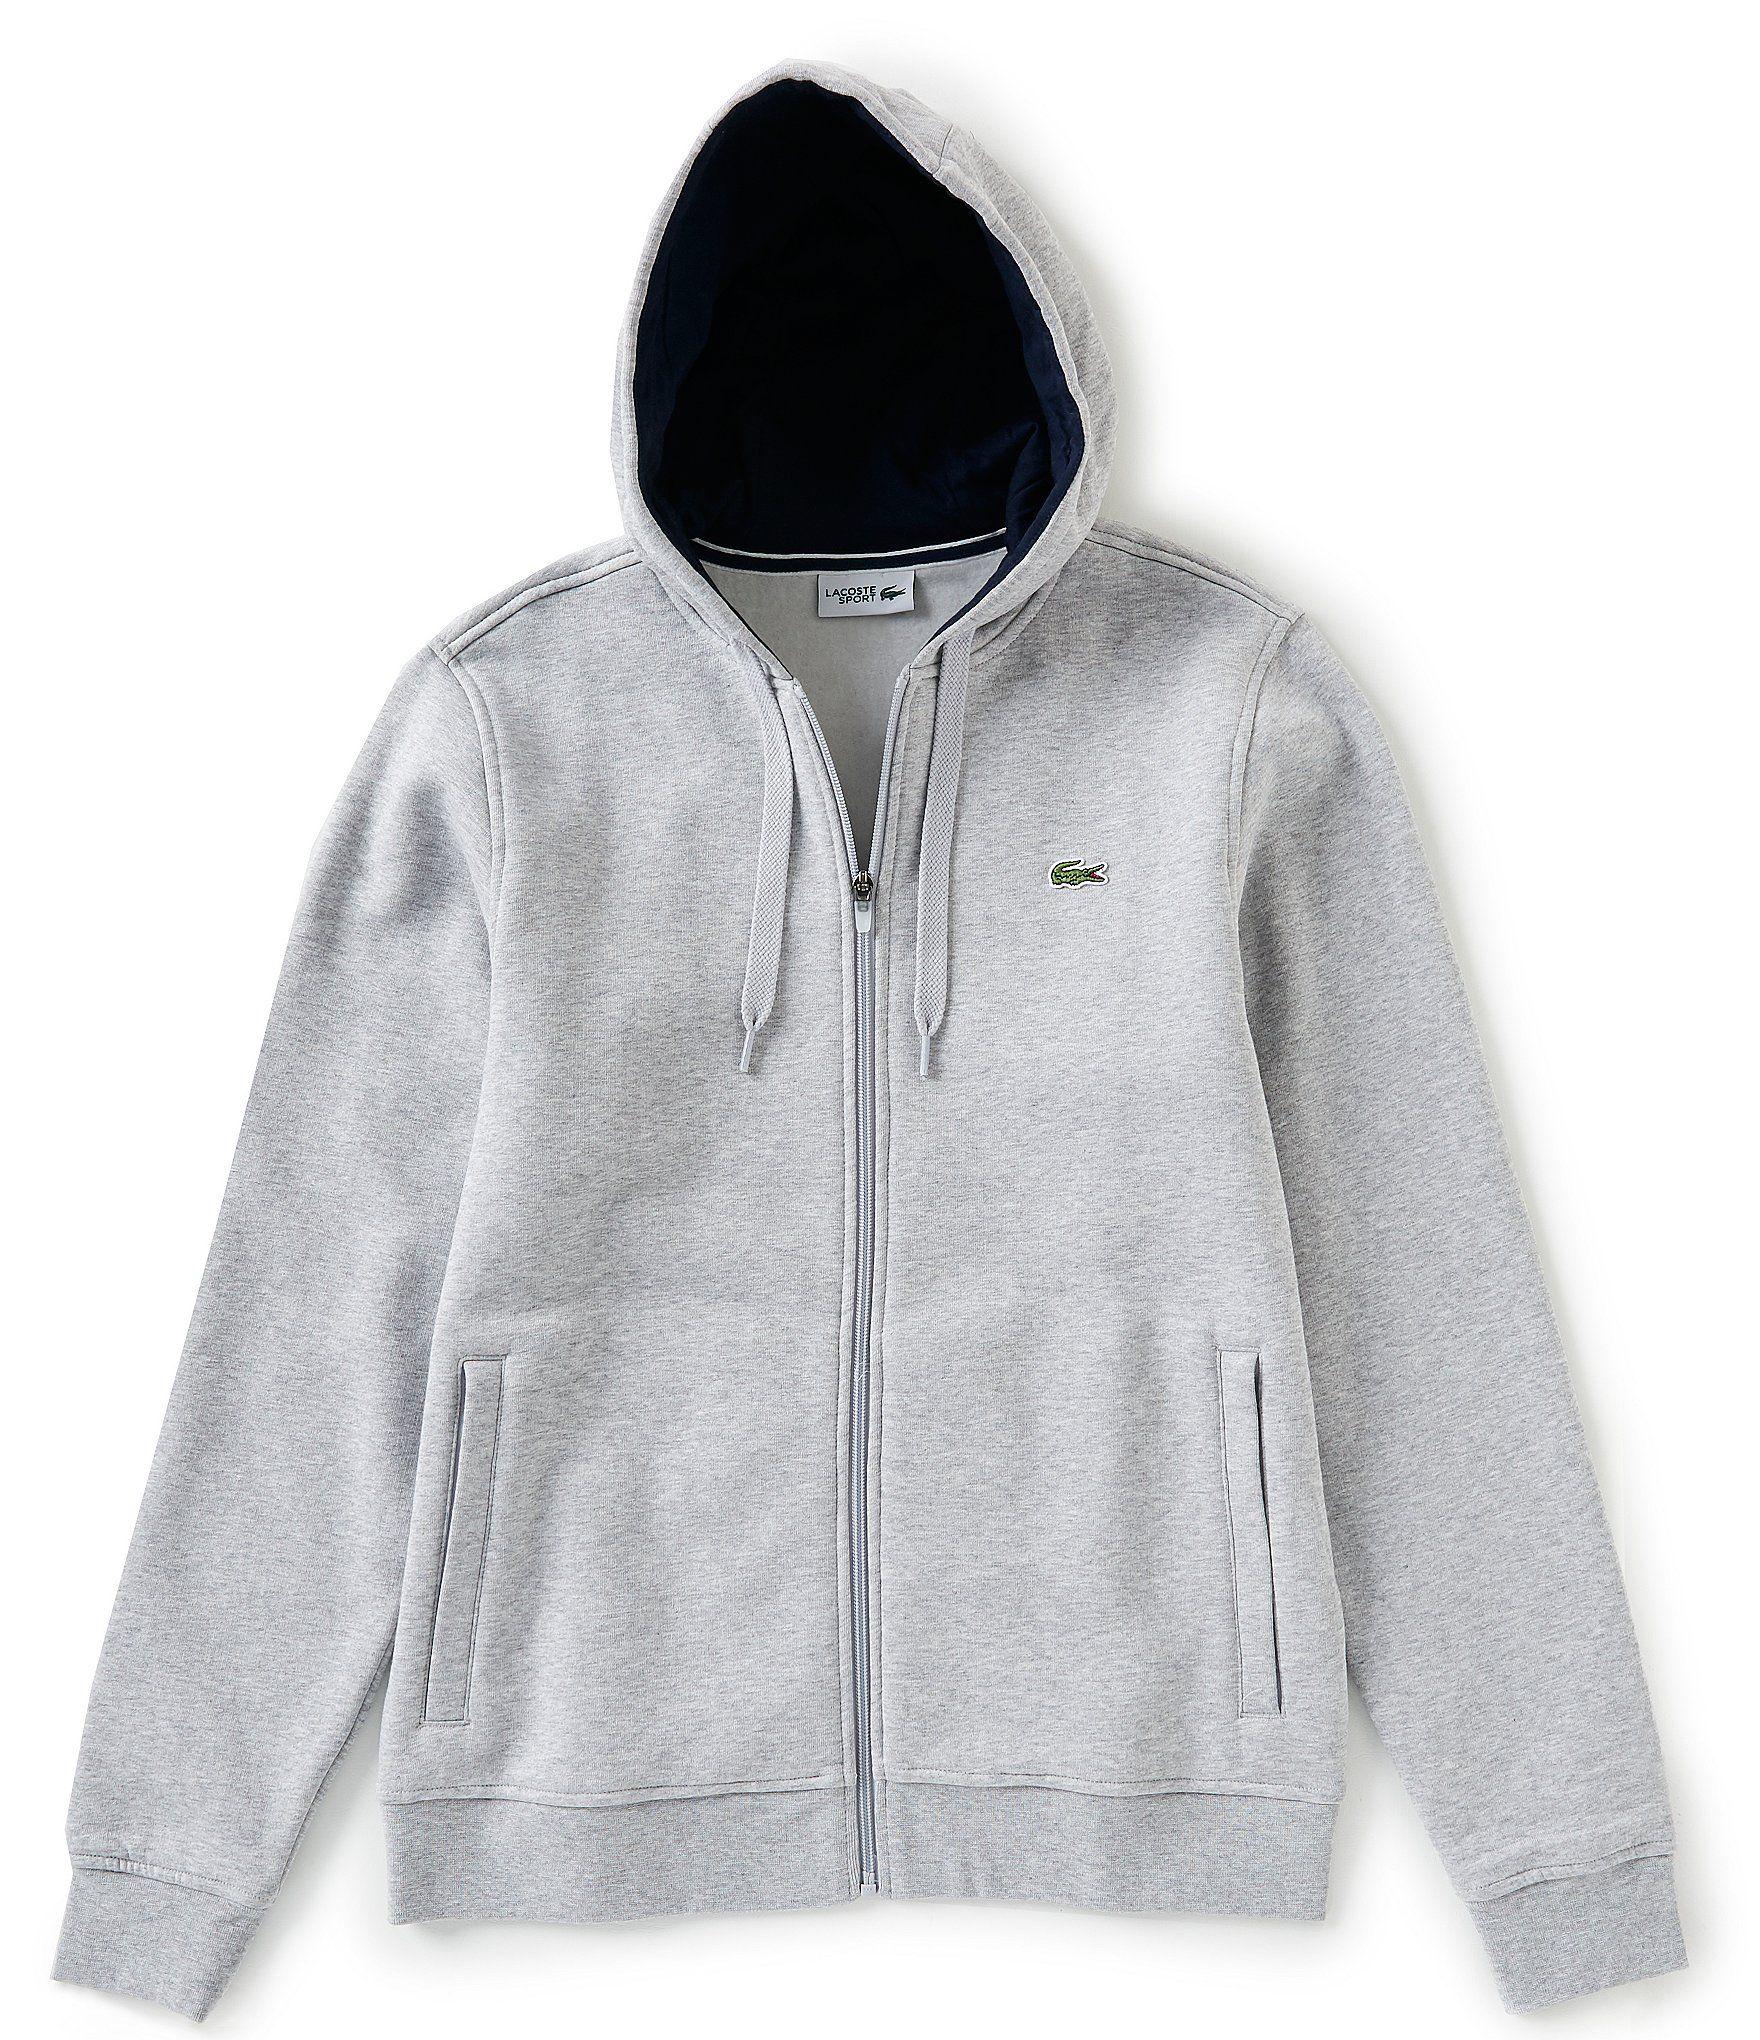 Lacoste Navy Blue//Silver Chine Full Zip Fleece Hoodie